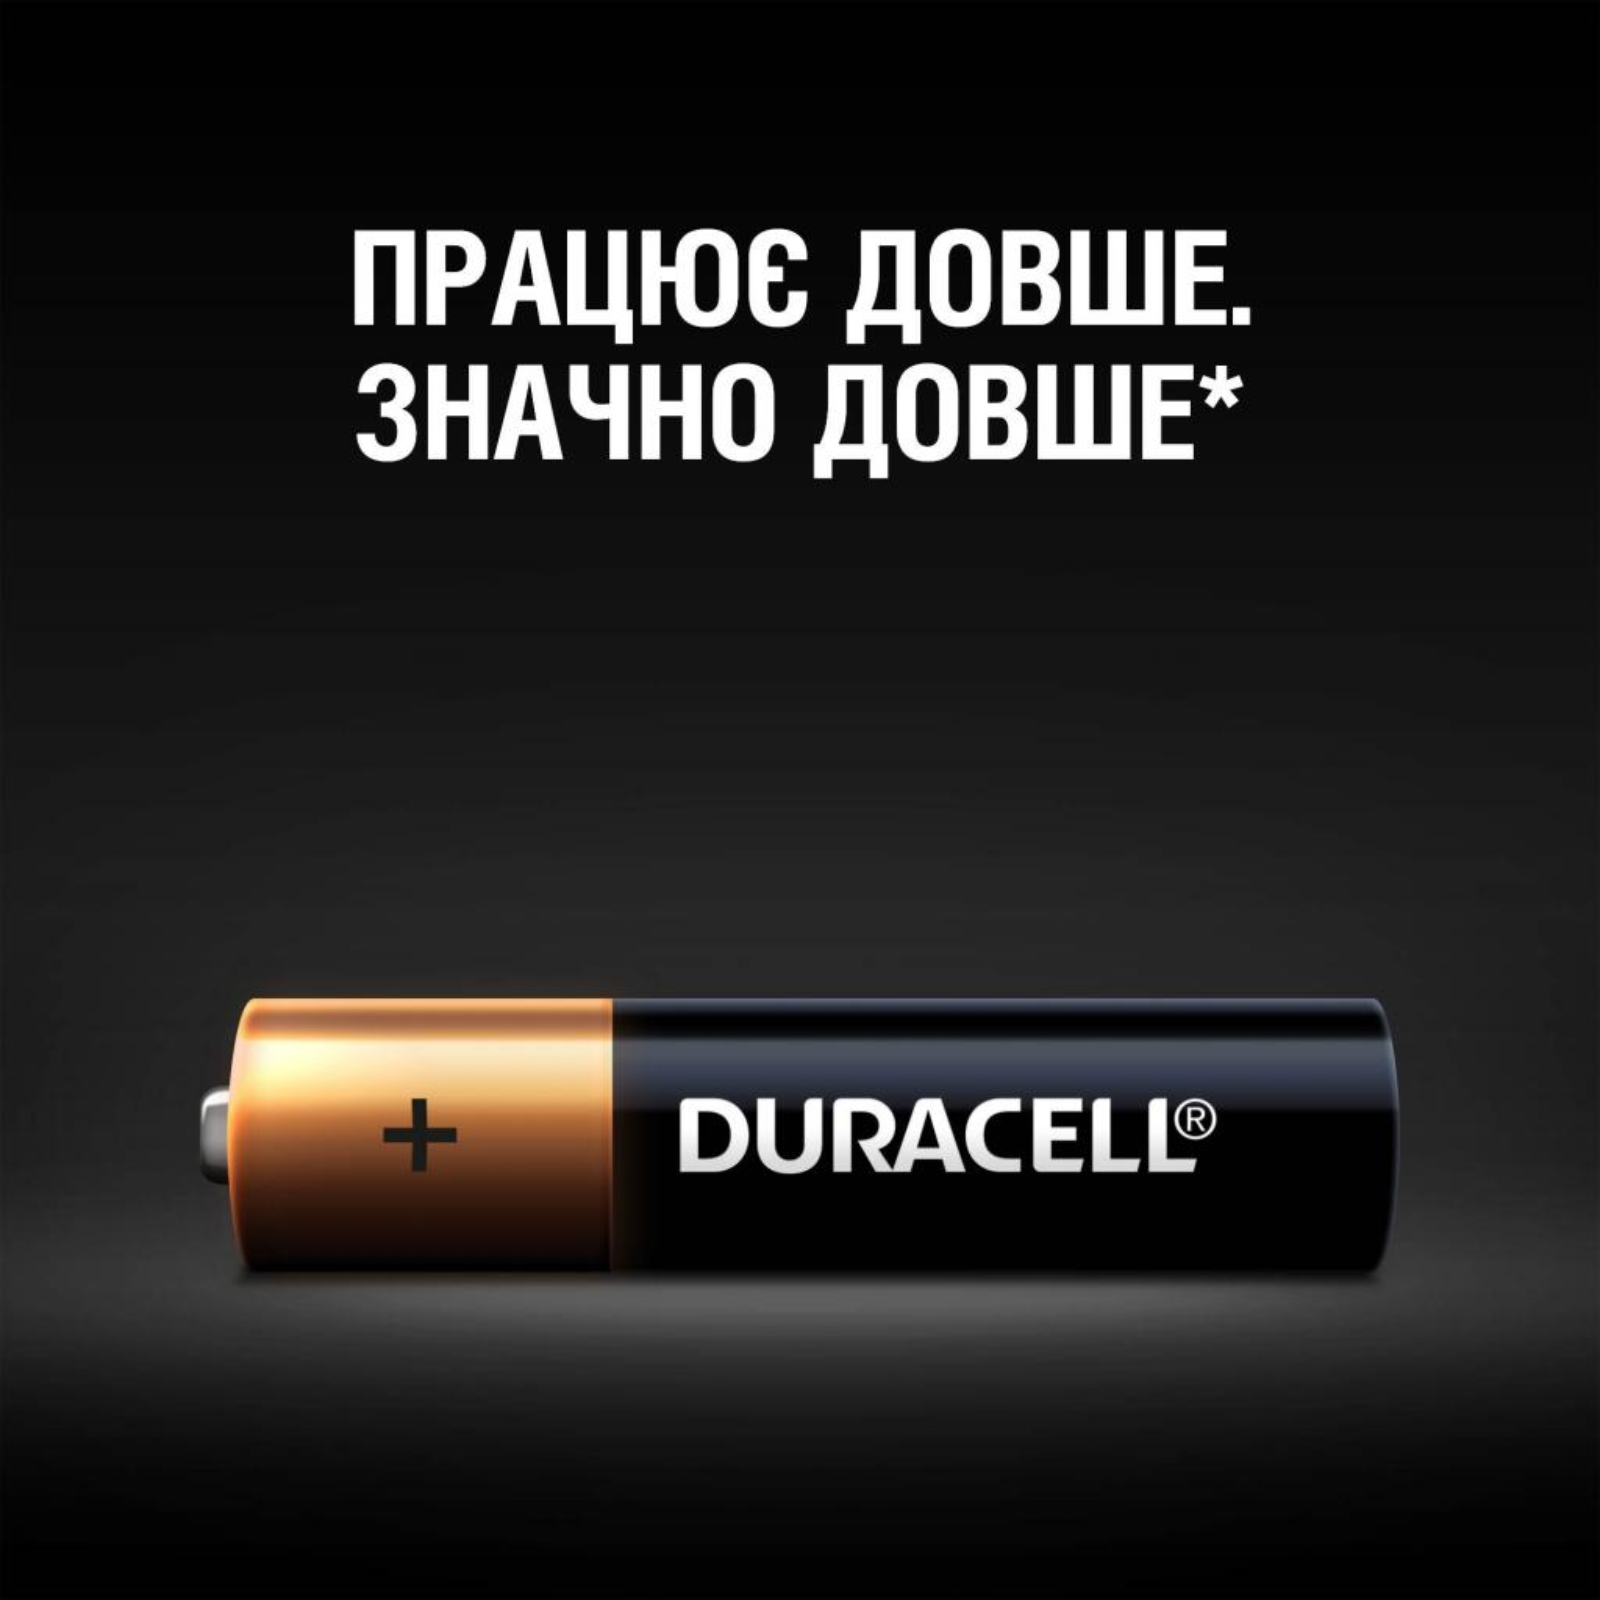 Батарейка Duracell AA MN1500 LR06 * 2 (5000394058163 / 81551267) изображение 3